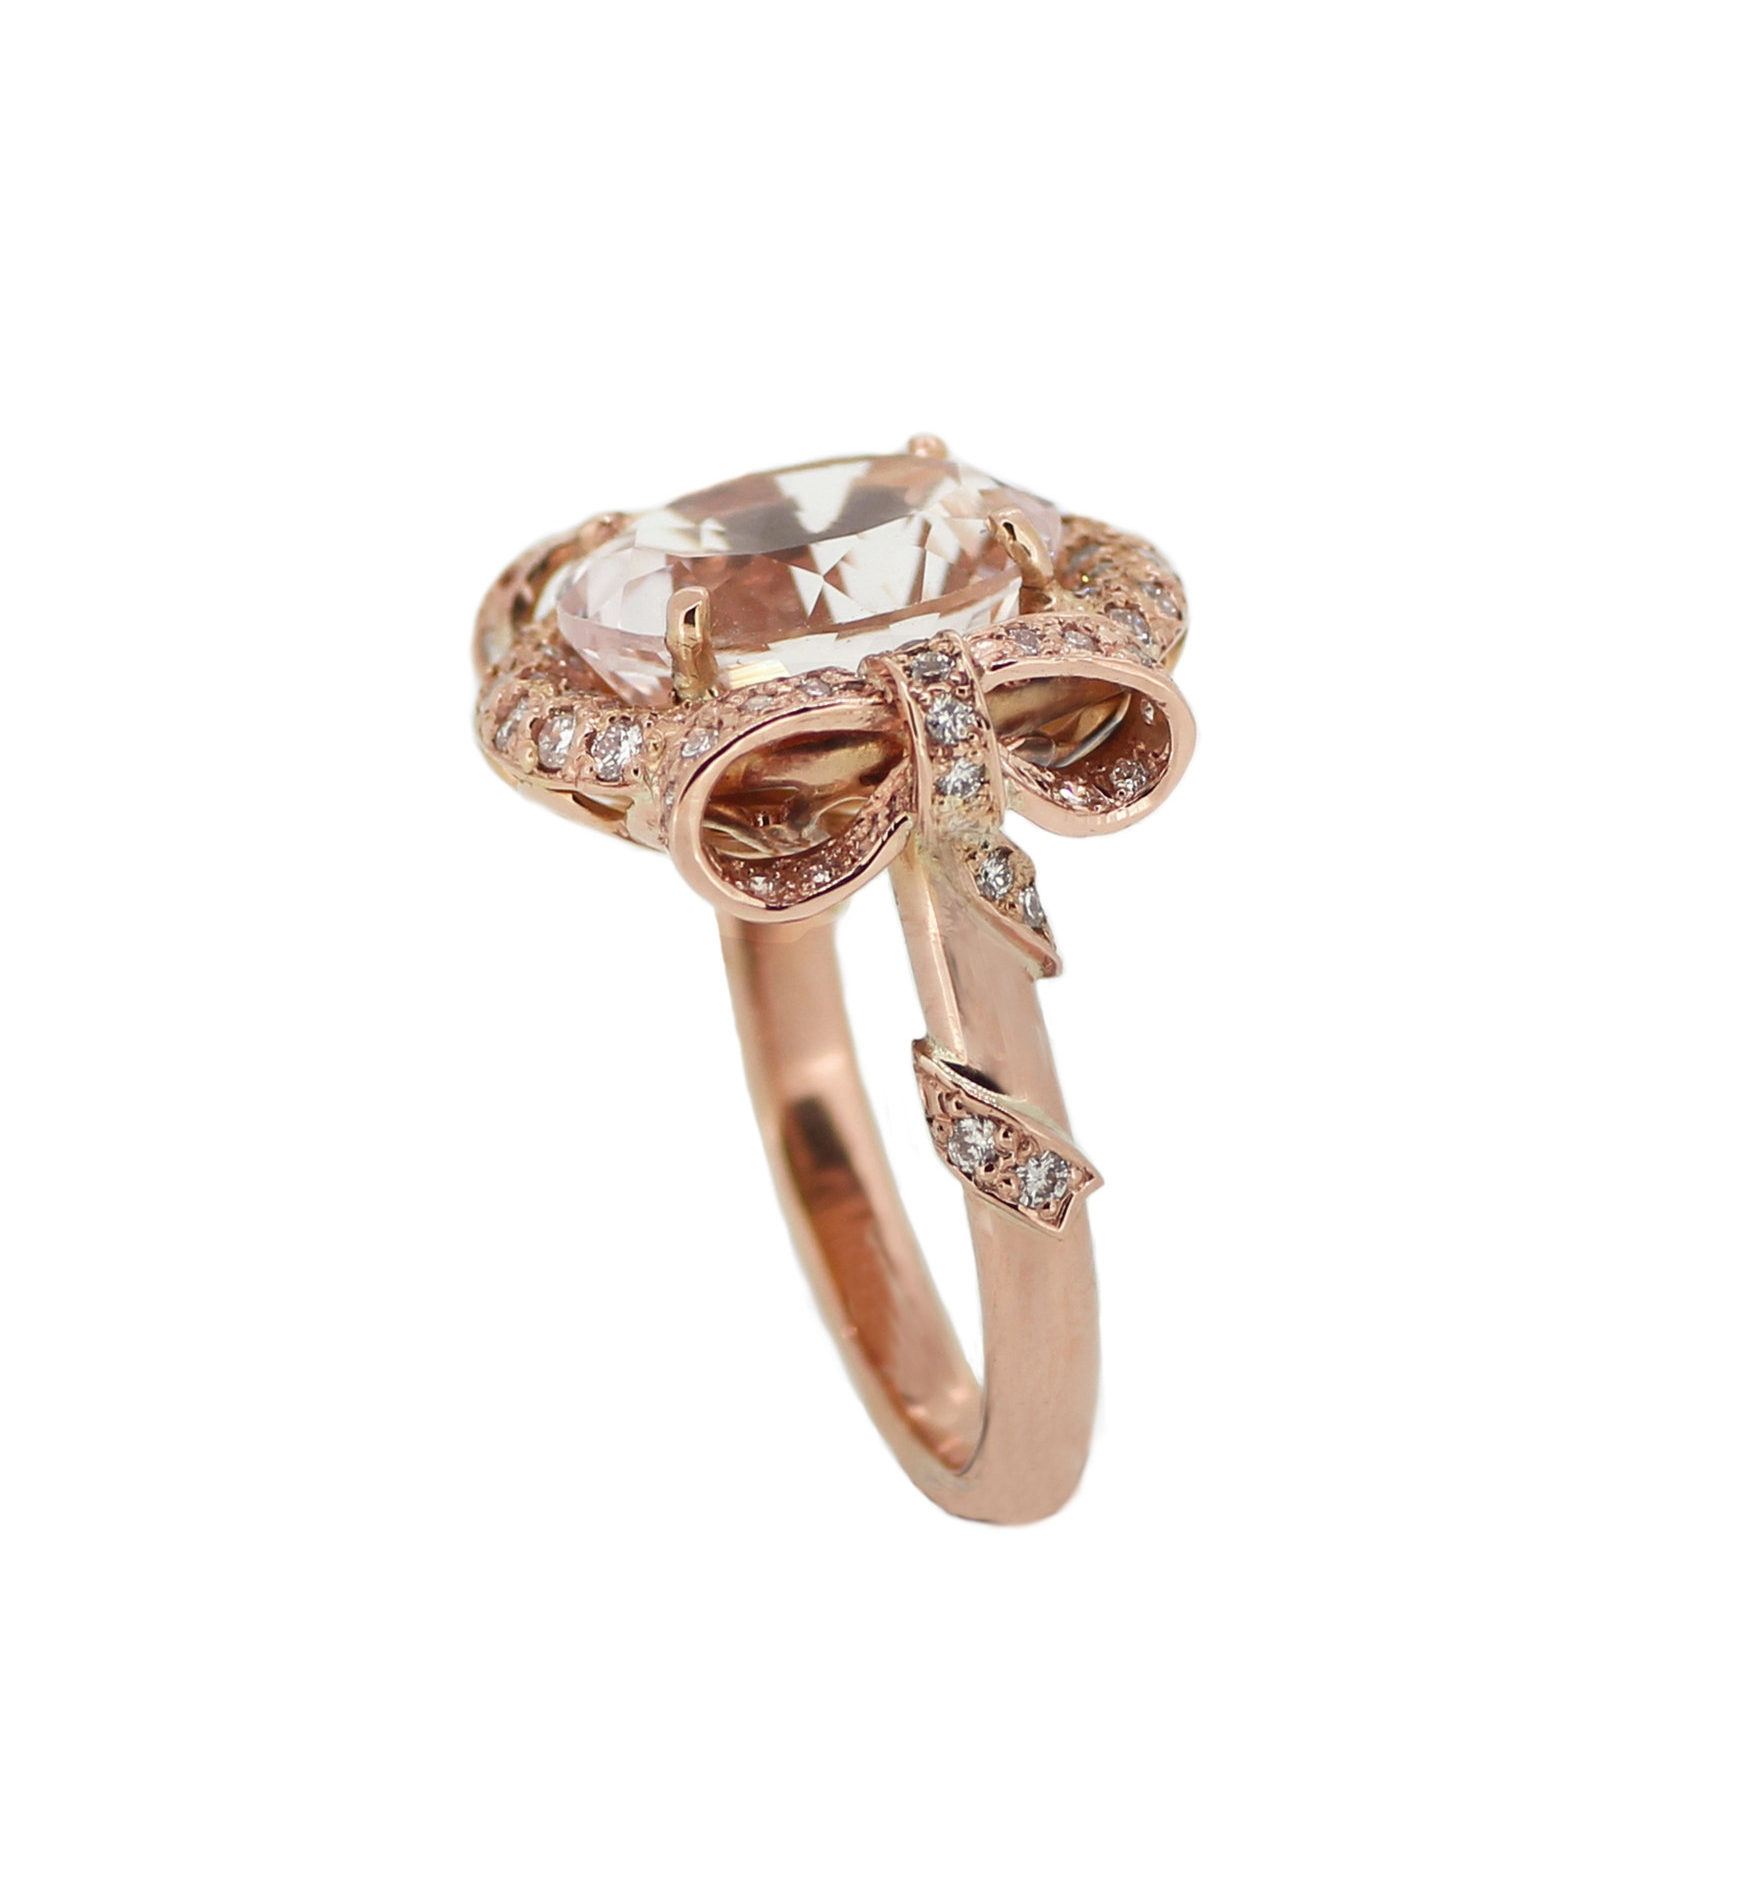 Bespoke Morganite & Diamond Bow Ring